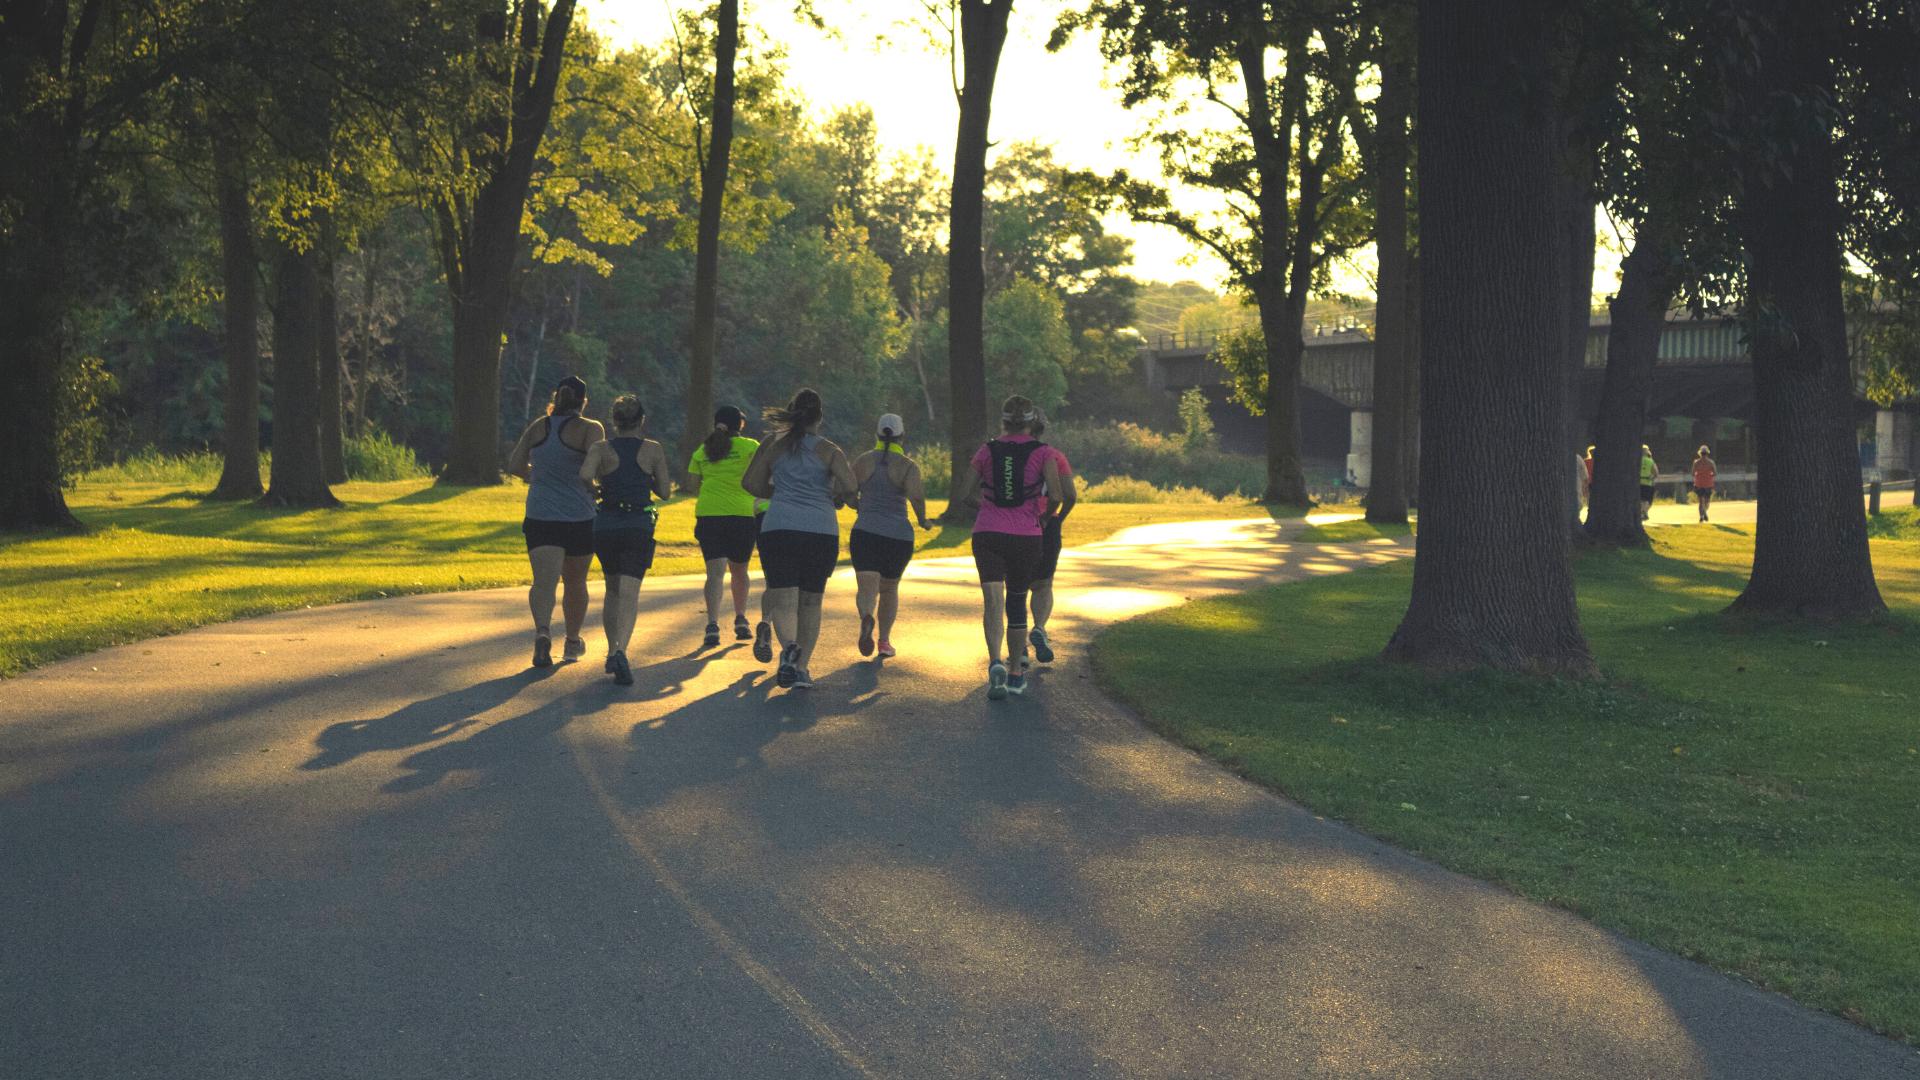 half marathon training in syracuse